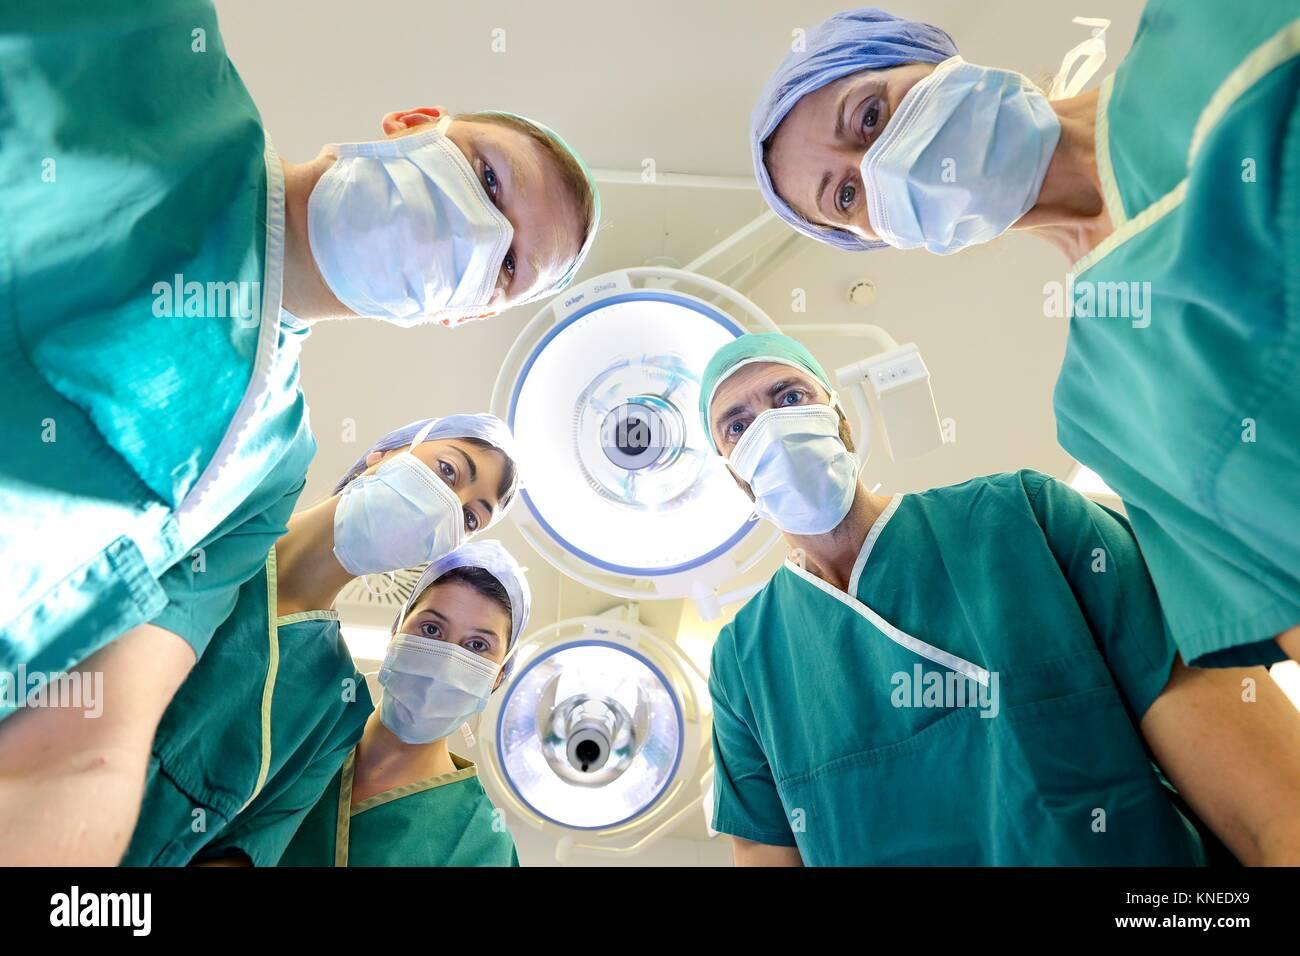 Surgeon, Surgery, Operating room, Hospital, Spain - Stock Image